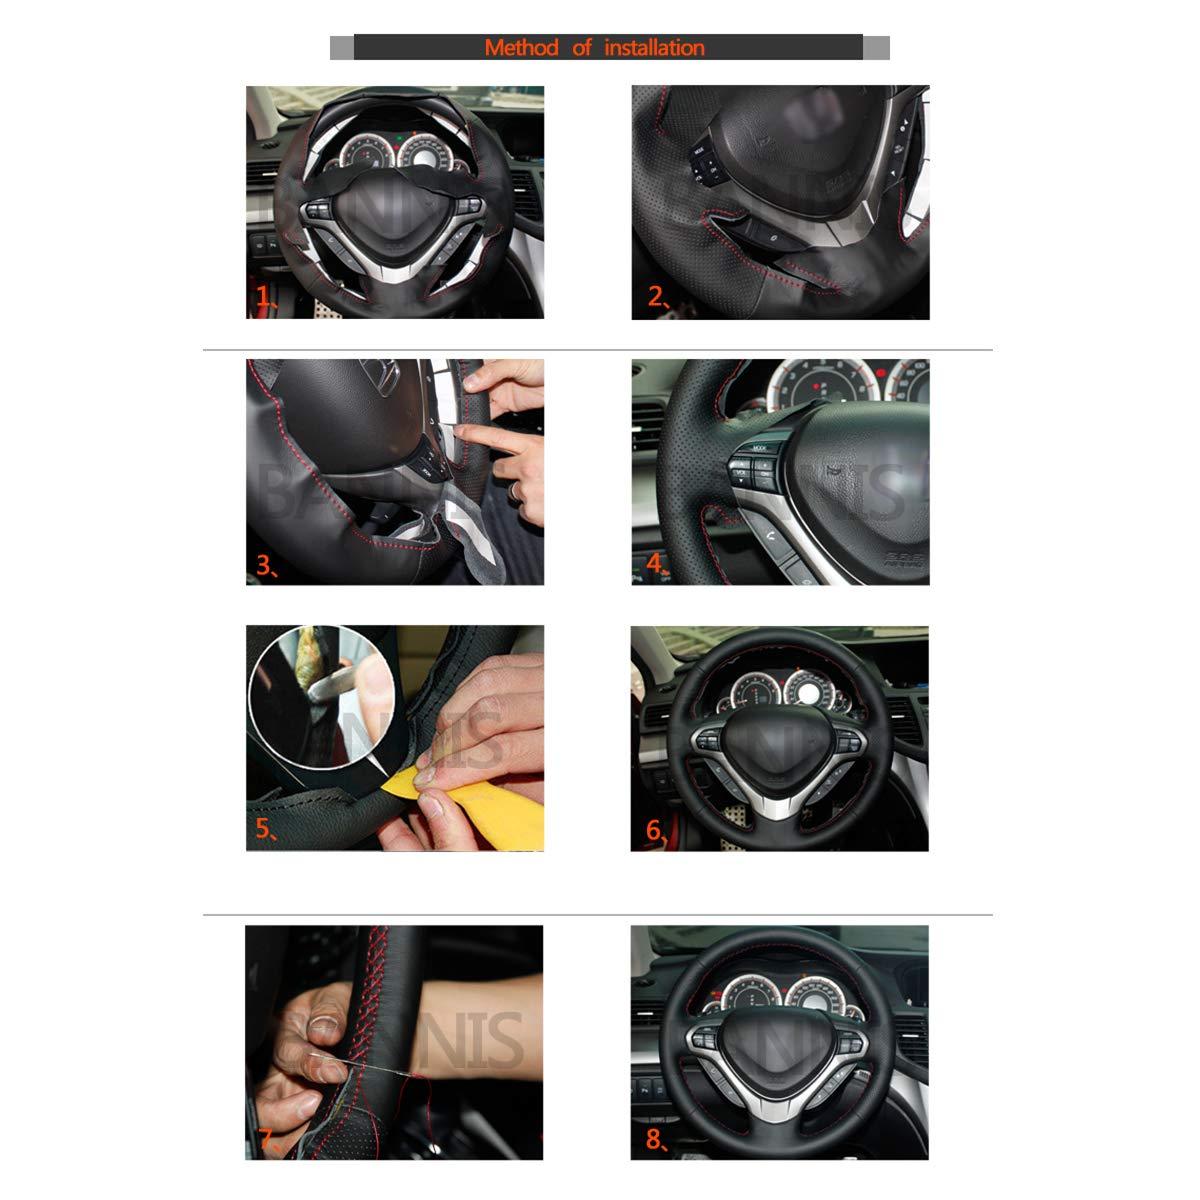 Shining wheat Funda para Volante de Piel sint/ética de Color Negro Brillante para Infi FX FX35 FX37 FX50 QX70 para Juke Maxima 370Z Sentra SV